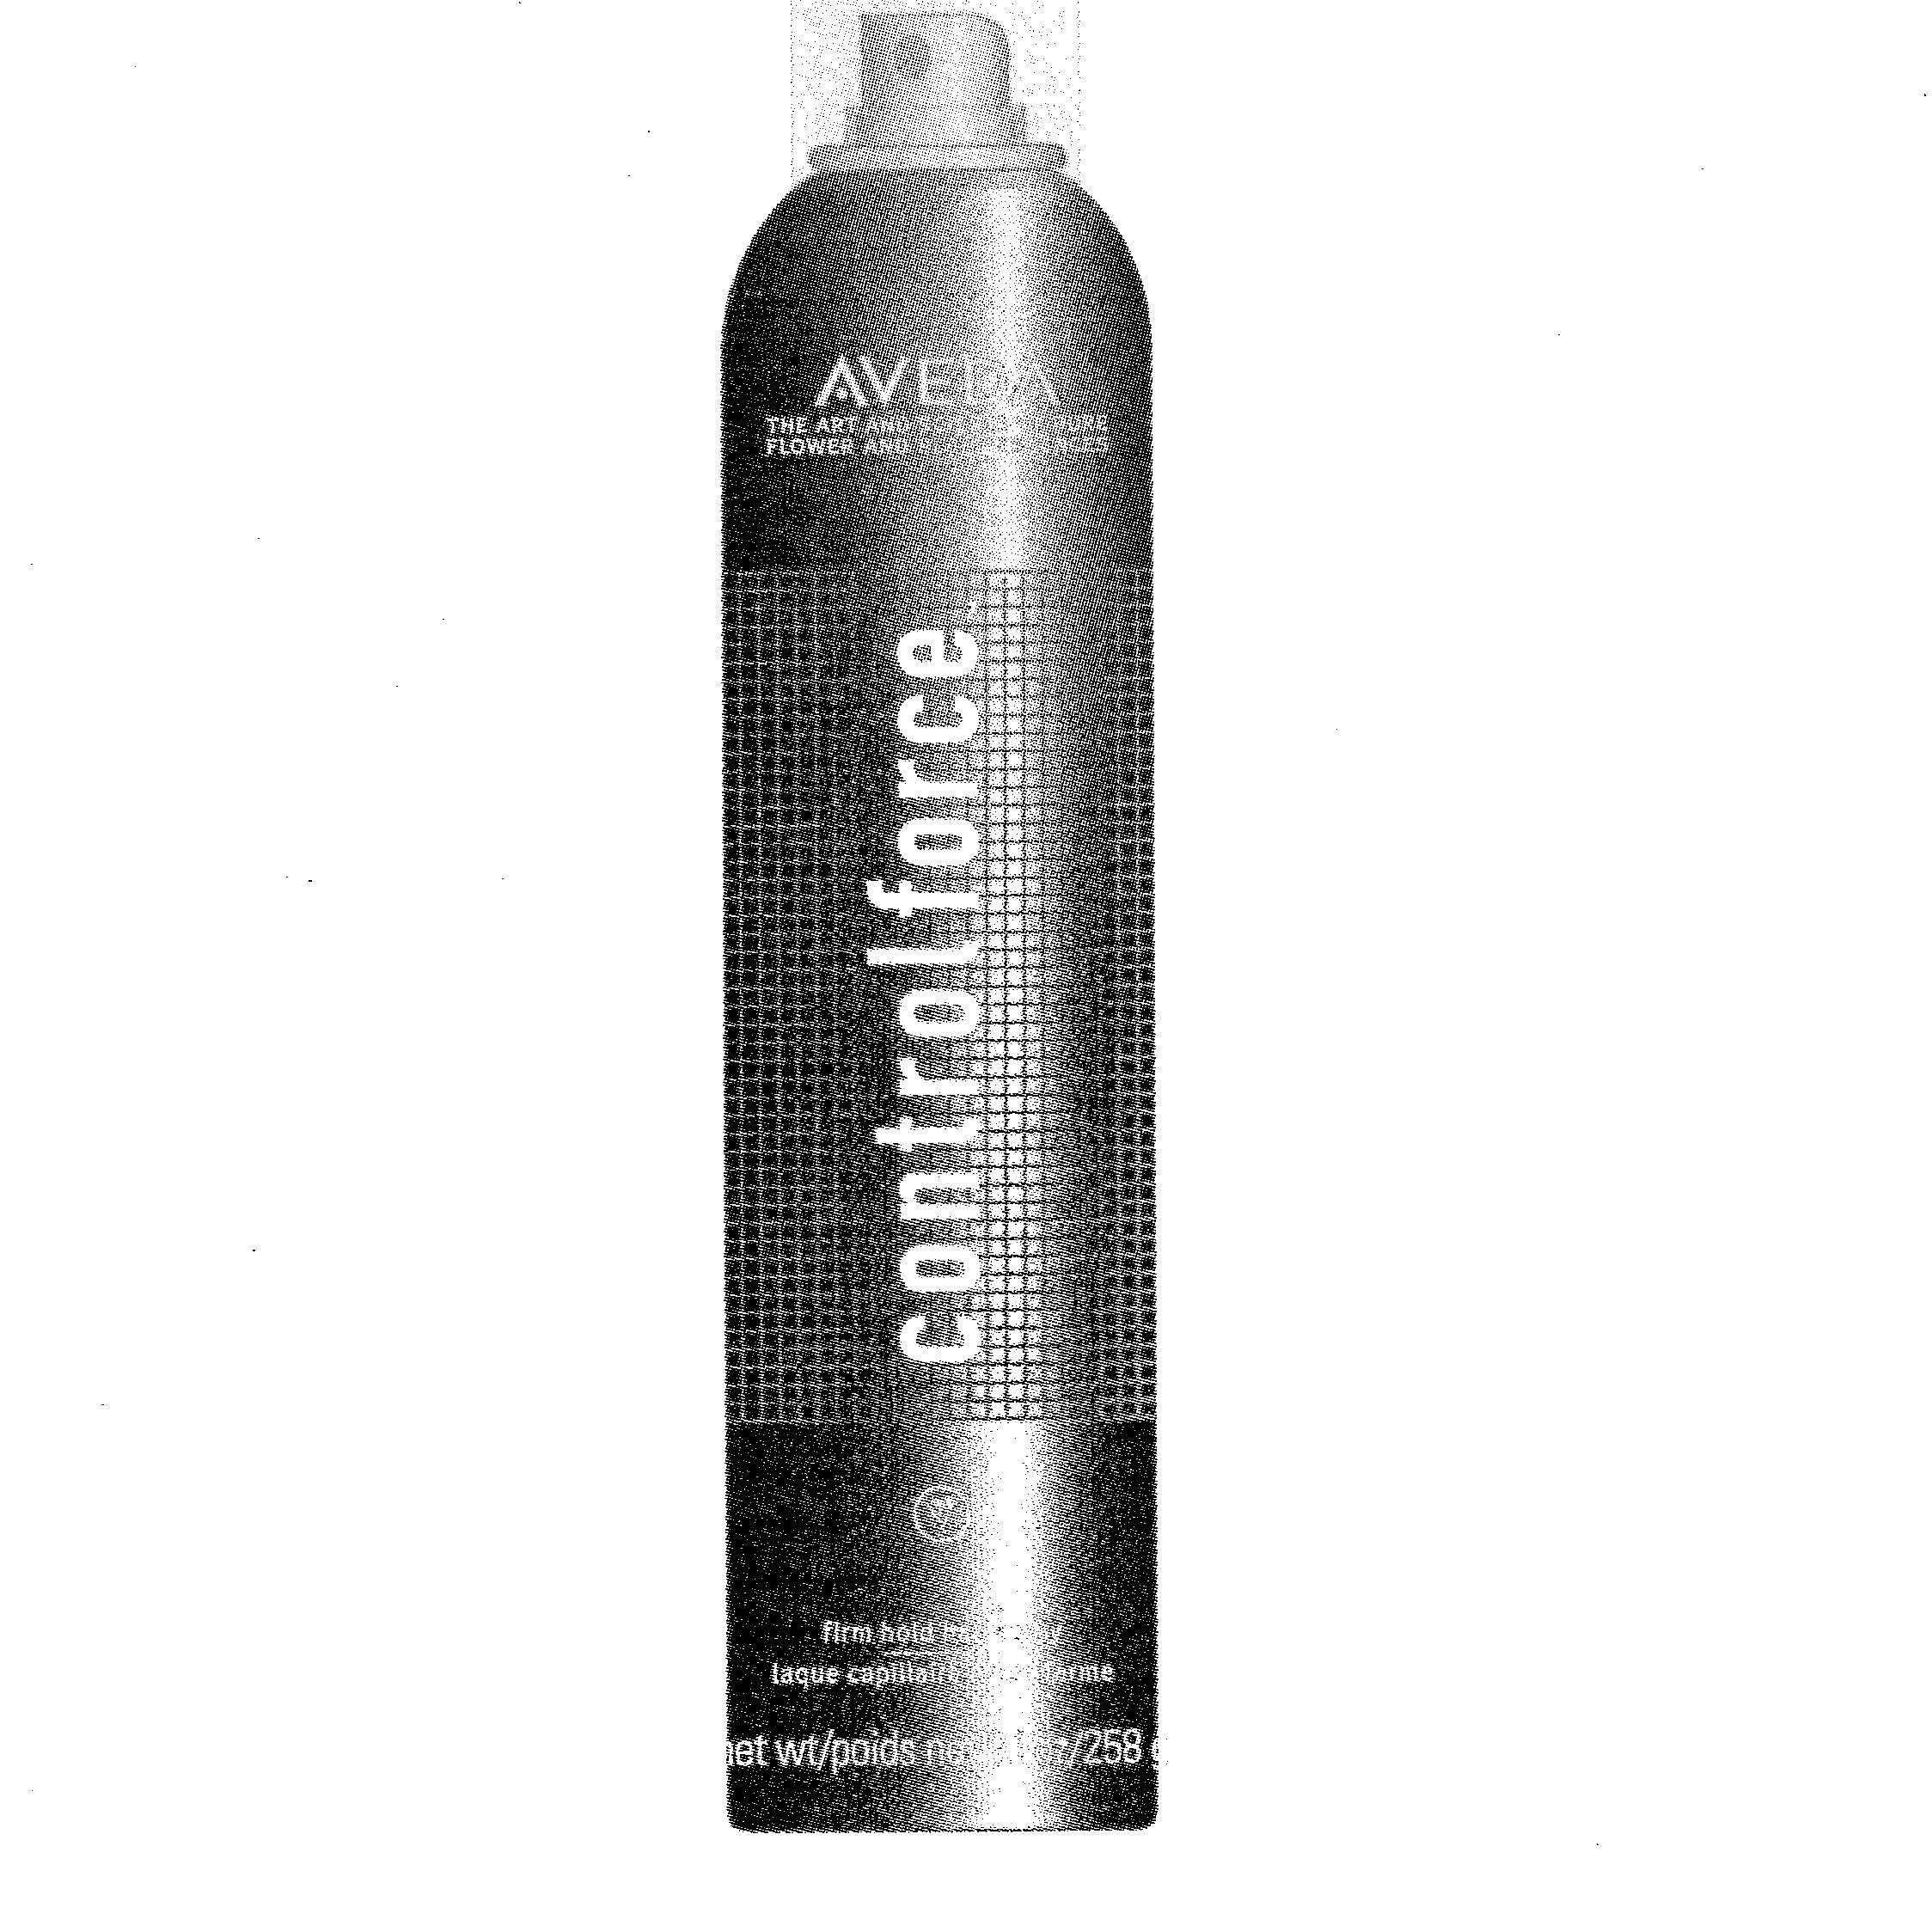 Aveda hairspray